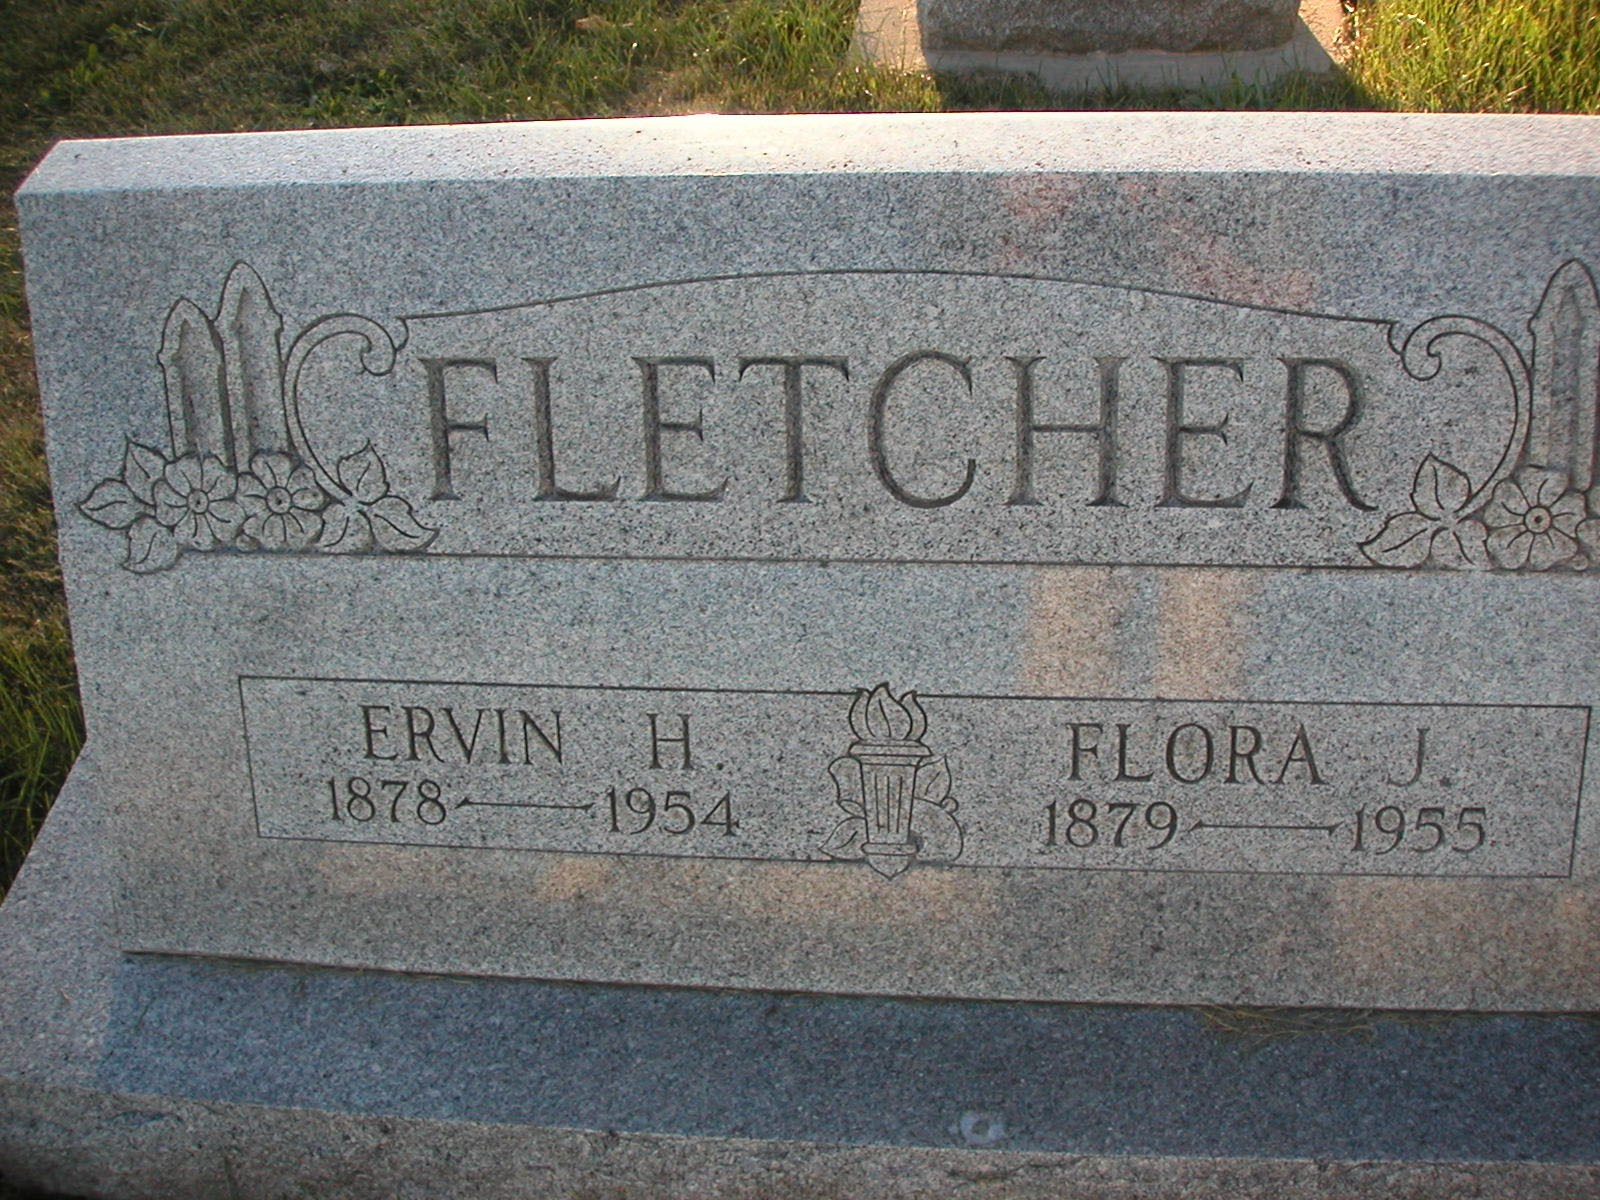 Estella Fletcher